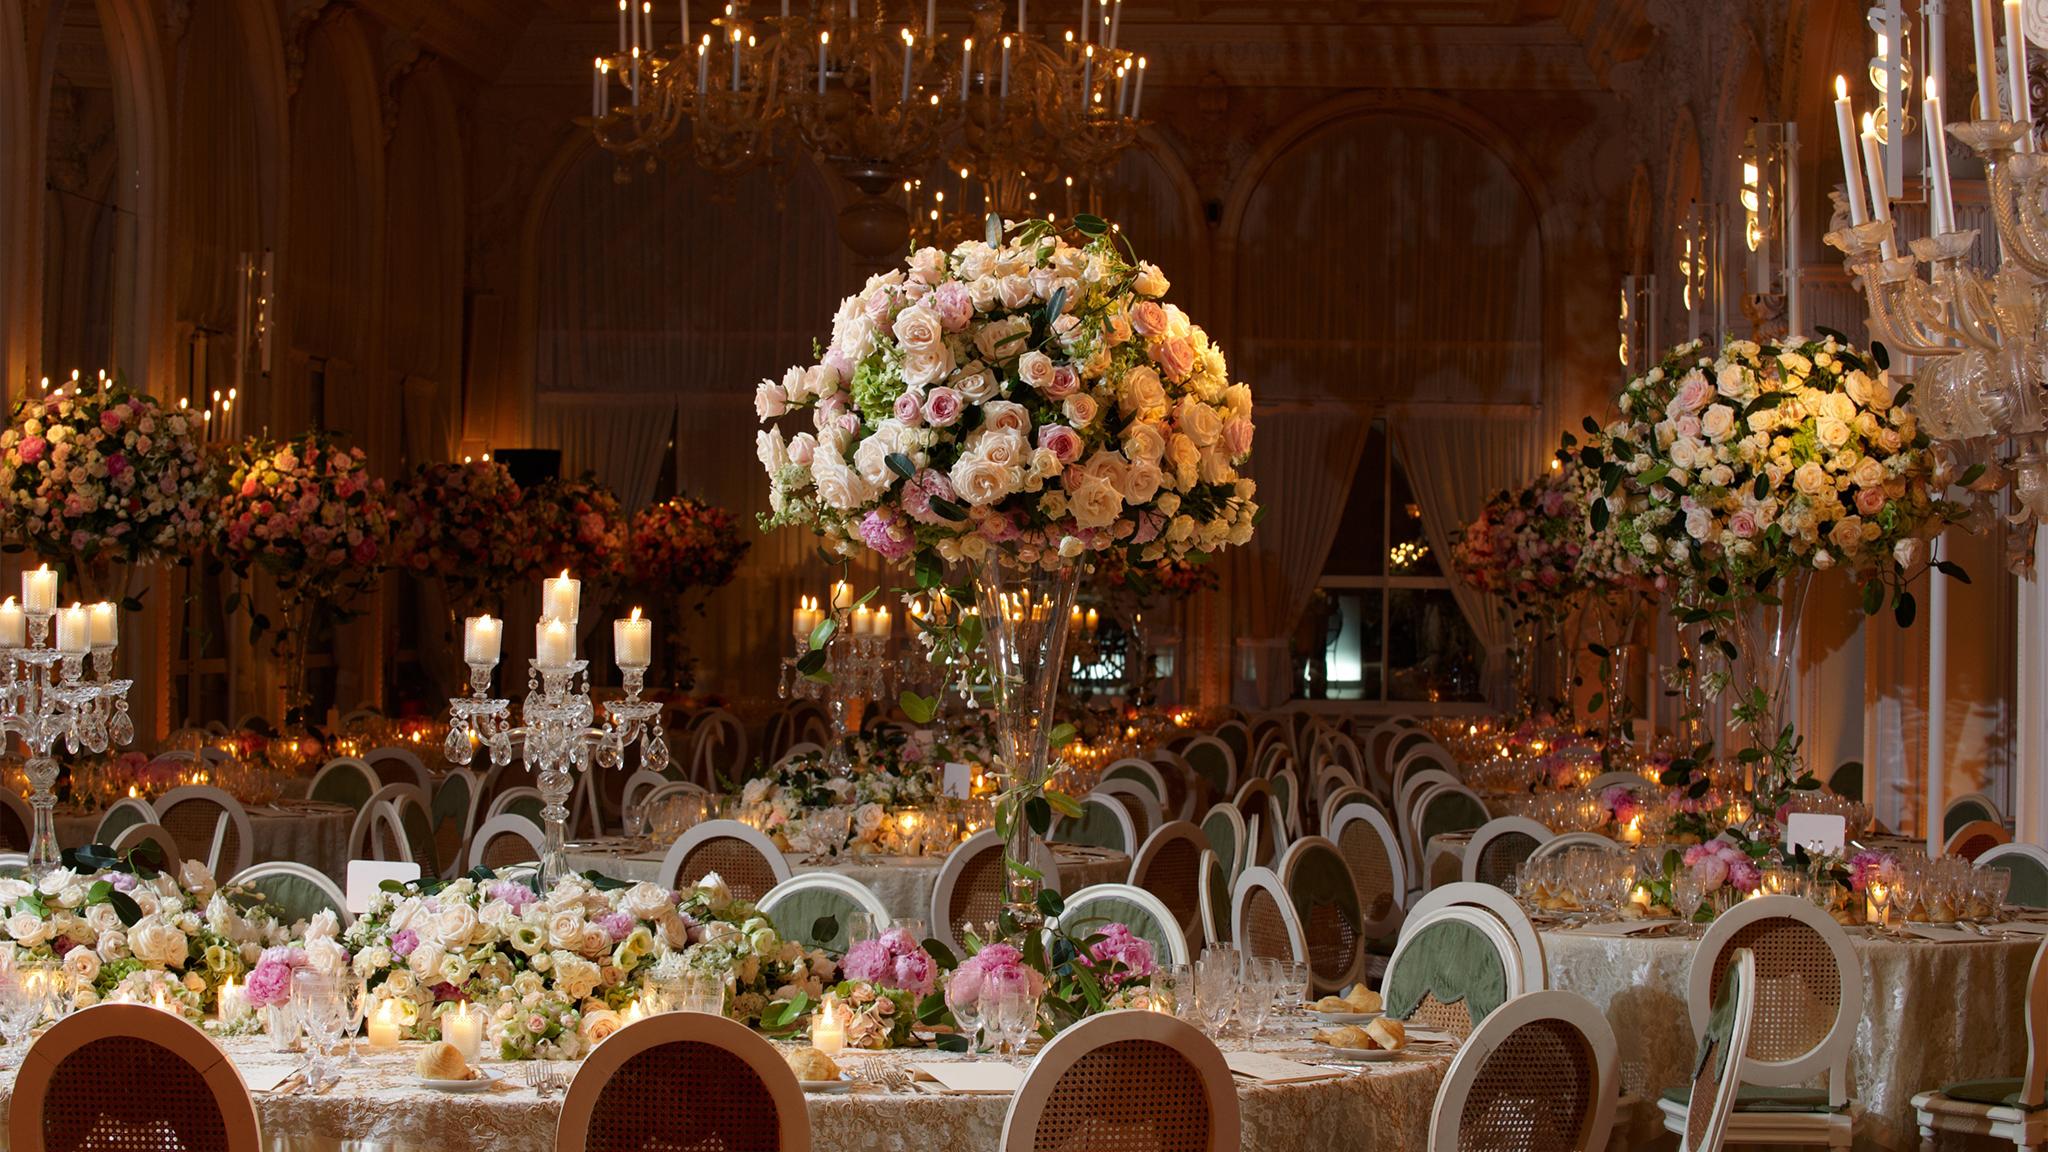 Let Wedding Flowers Send A Green Message Says Royal Florist Shane